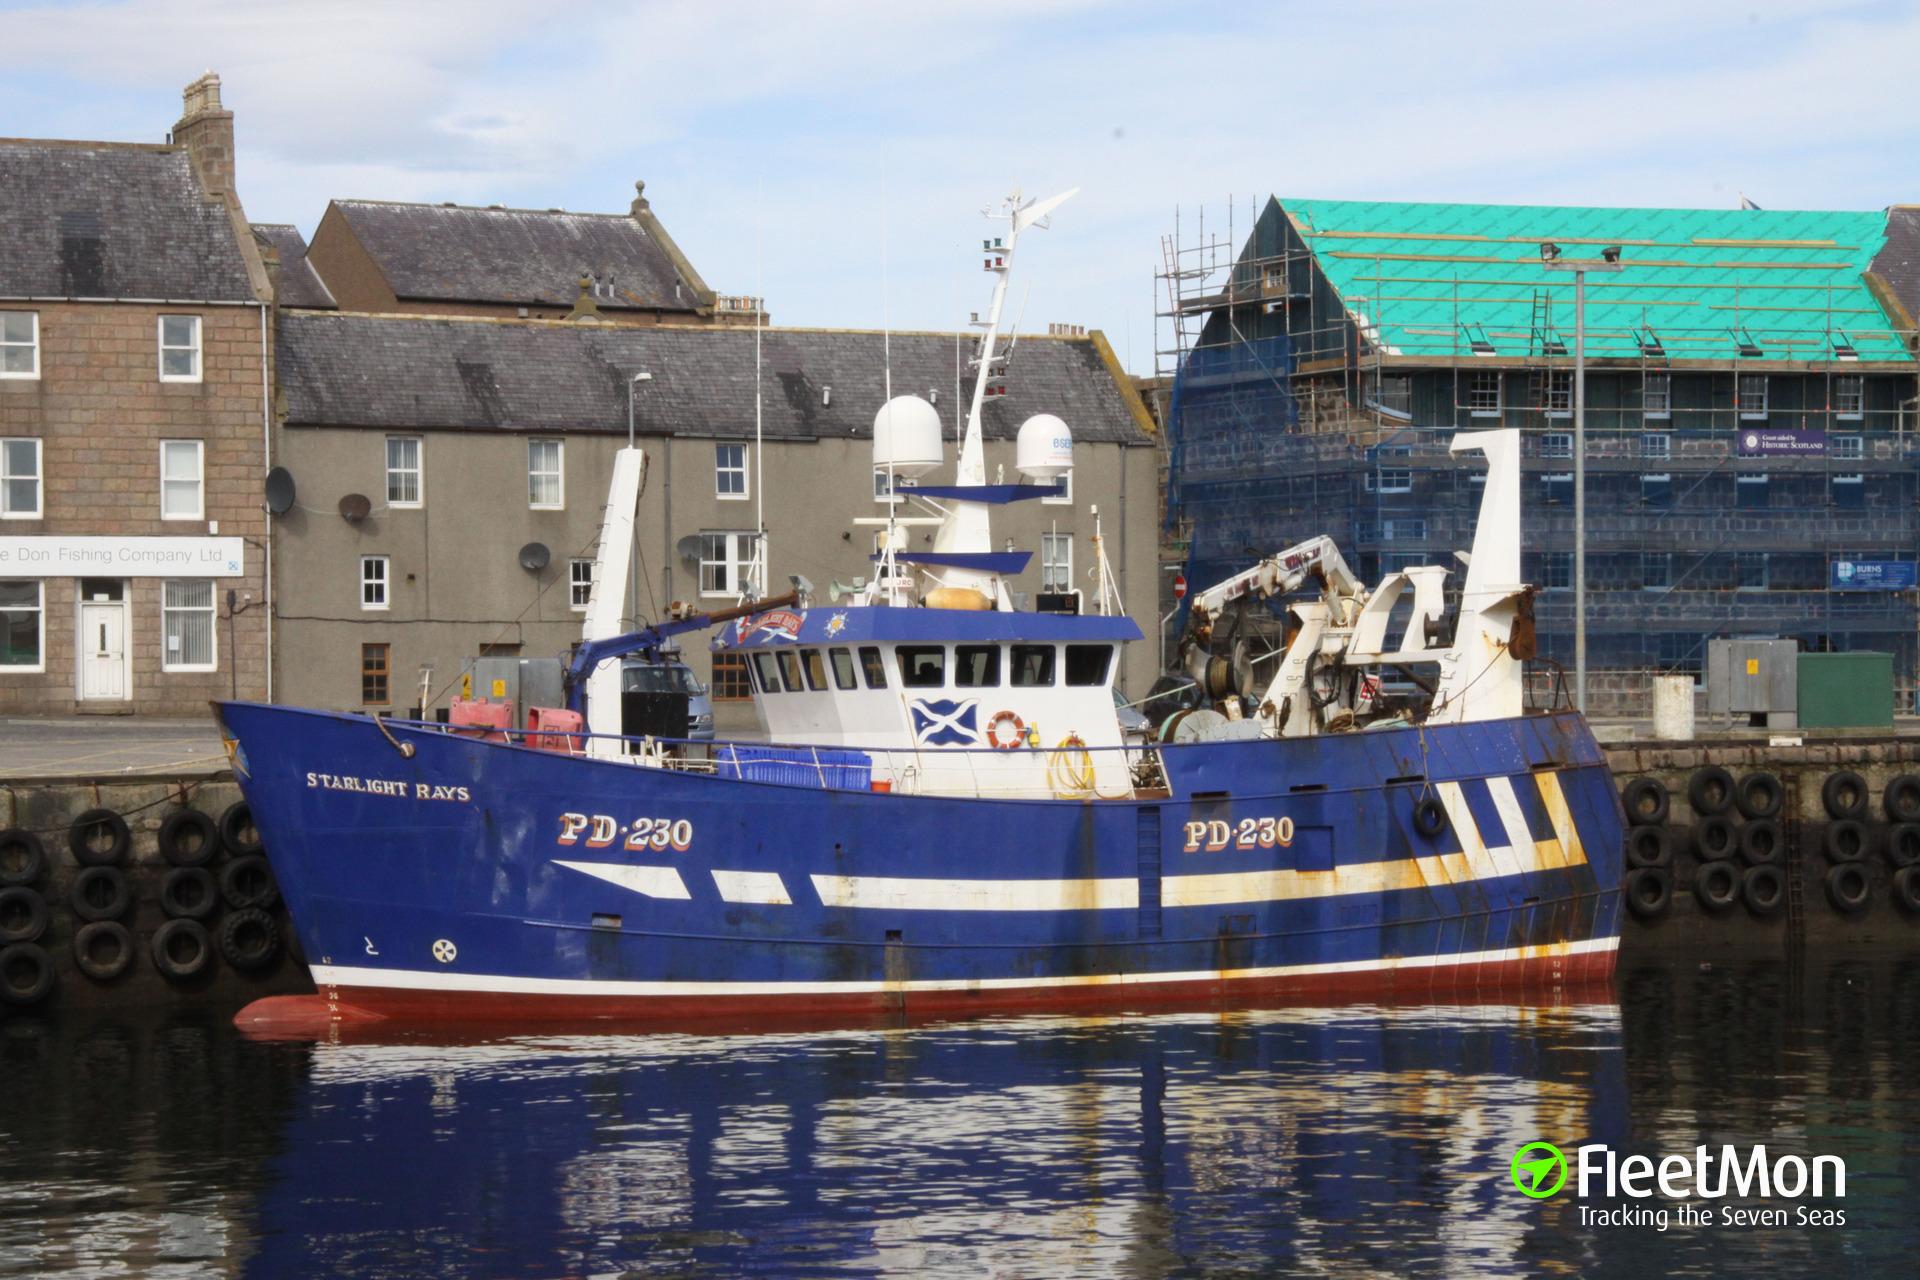 Fishing vessel STARLIGHT RAYS managed to stop water ingress